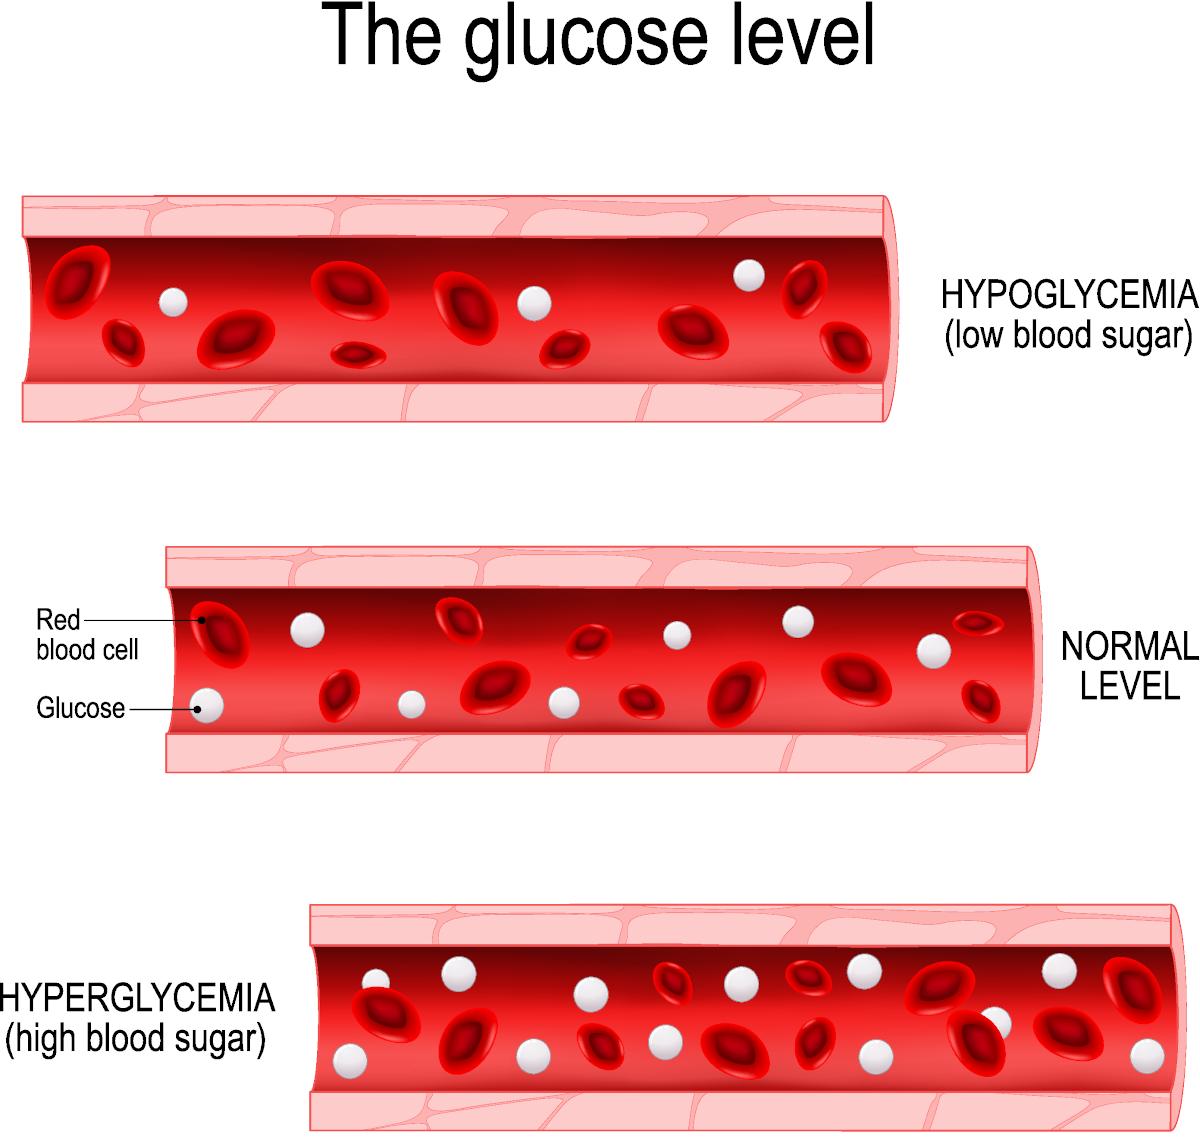 Hypoglycaemia is low blood sugar